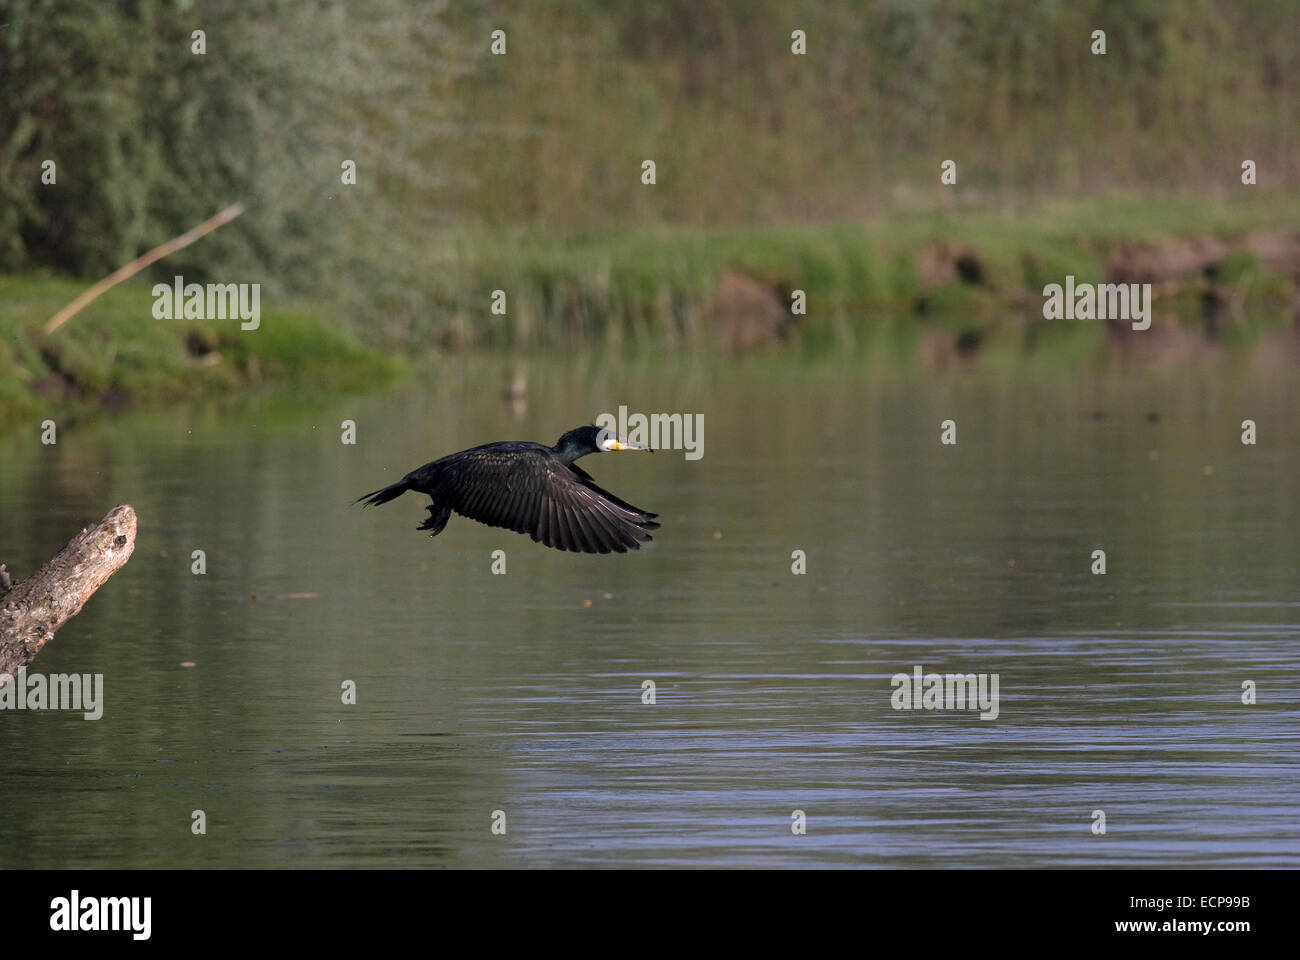 Cormorant (Phalacrocorax carbo) in flight, Danube delta, Romania, Europa - Stock Image